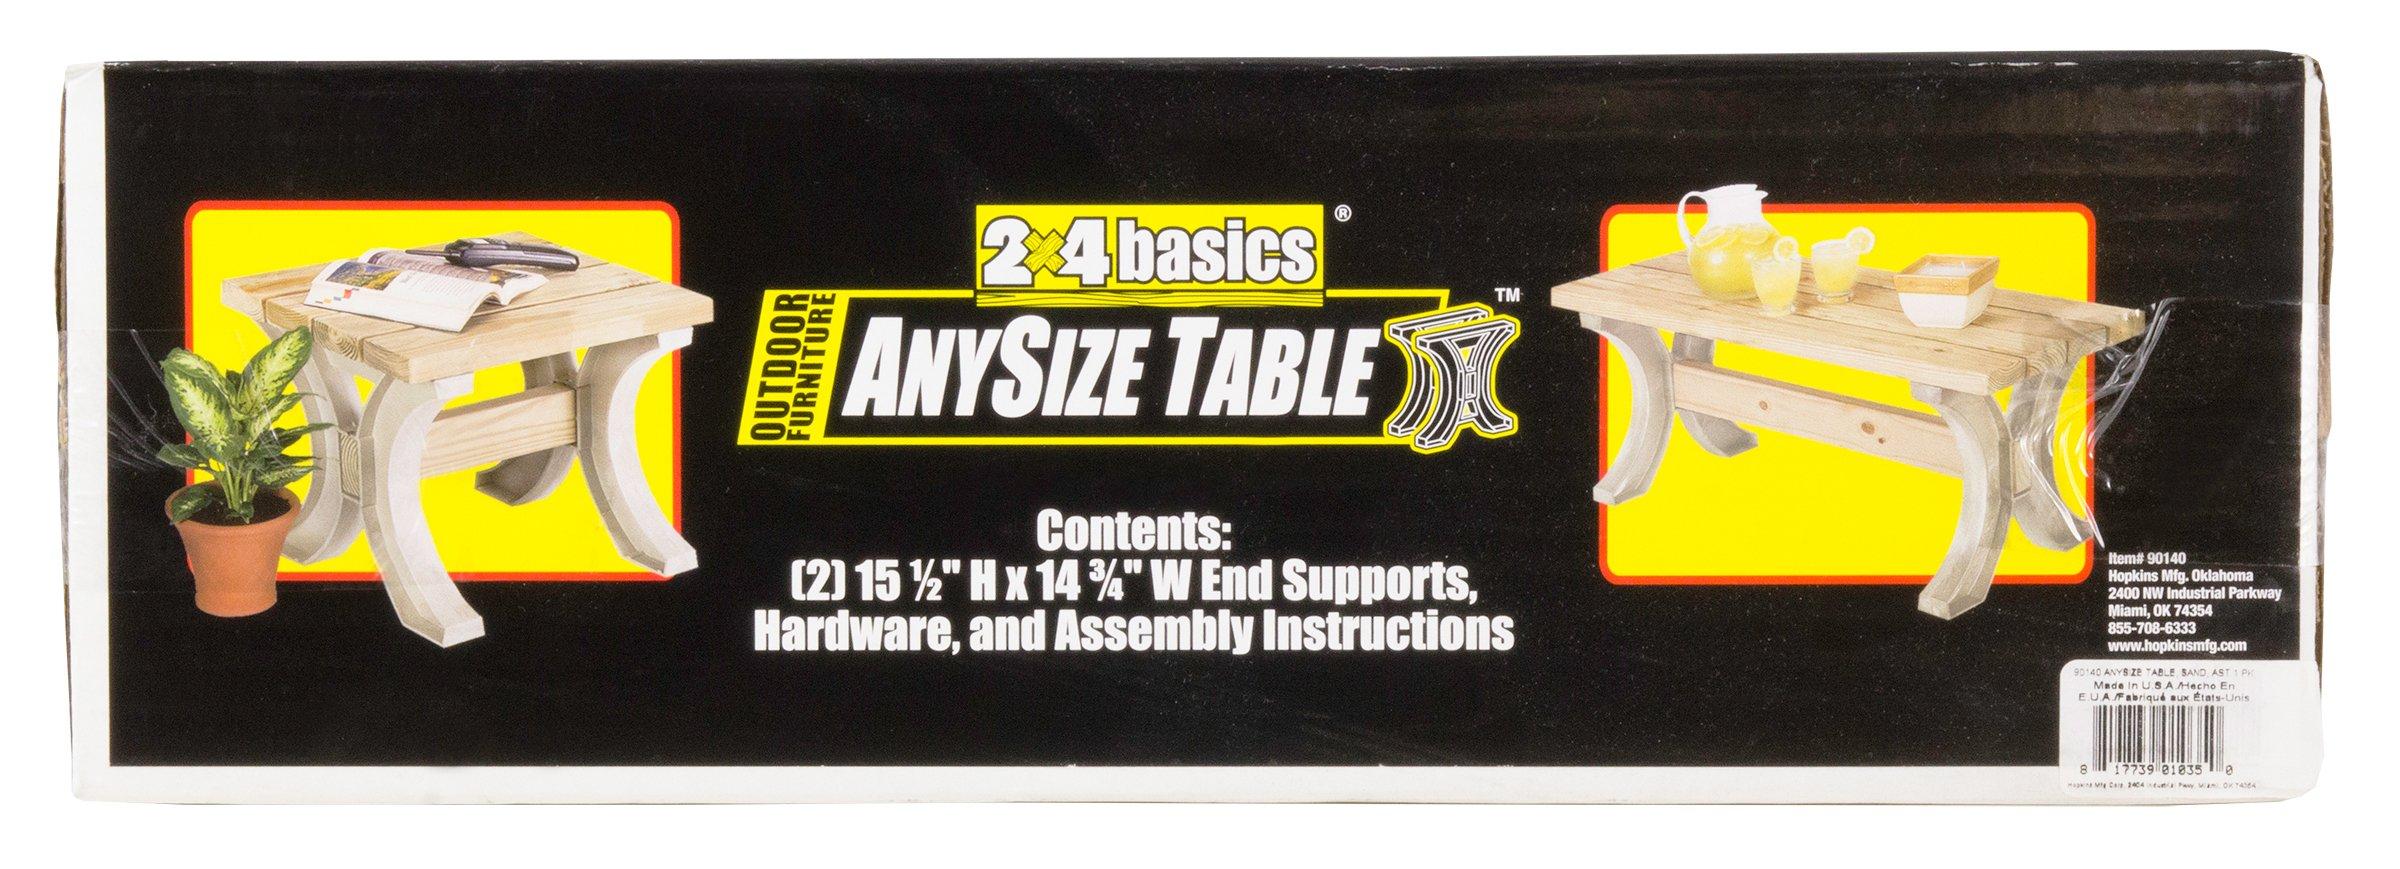 Hopkins 90140 2x4basics AnySize Table, Sand